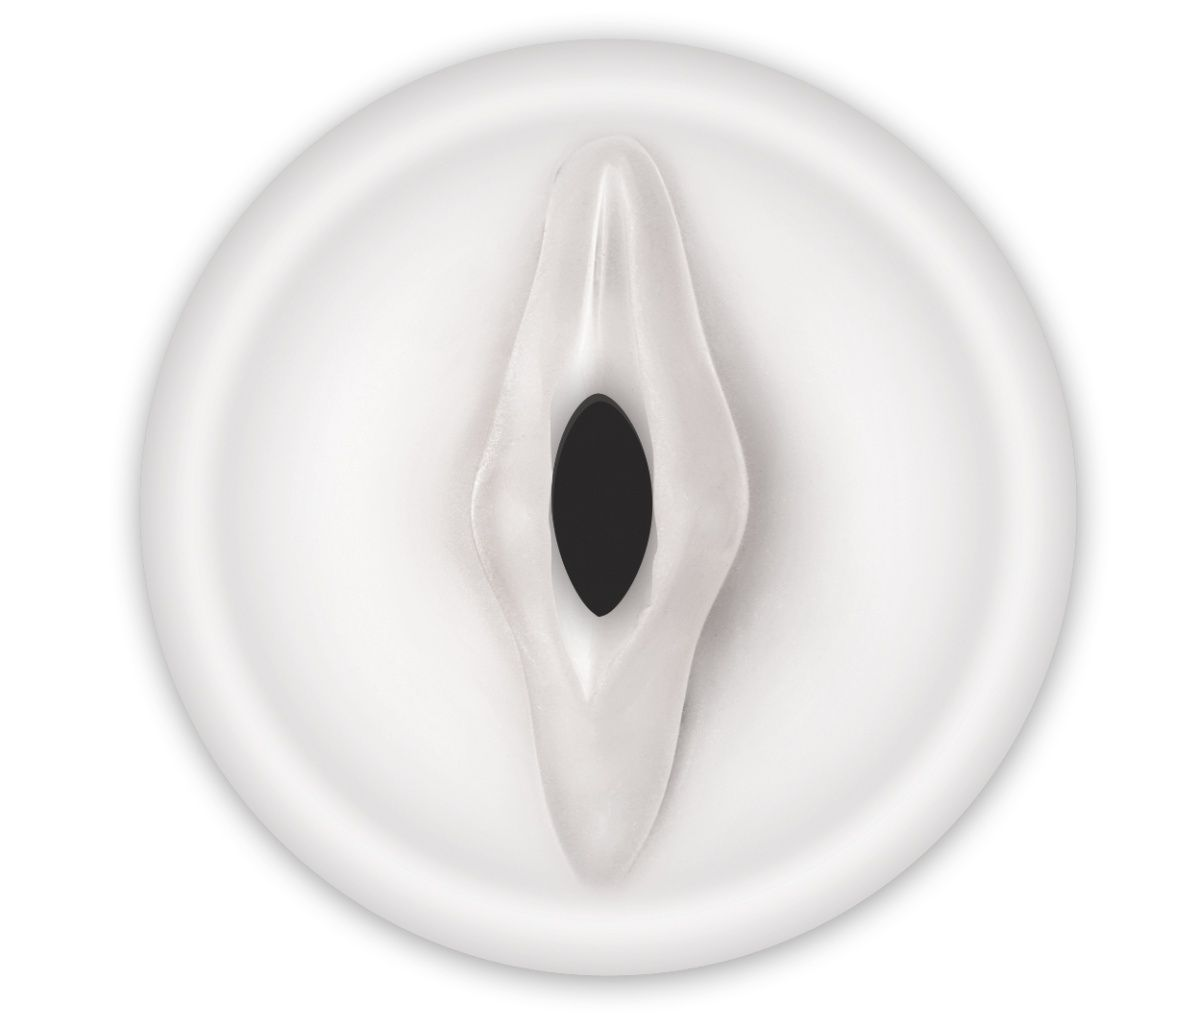 Насадка-уплотнитель на помпу Universal Pump Sleeve Vagina - фото 170149